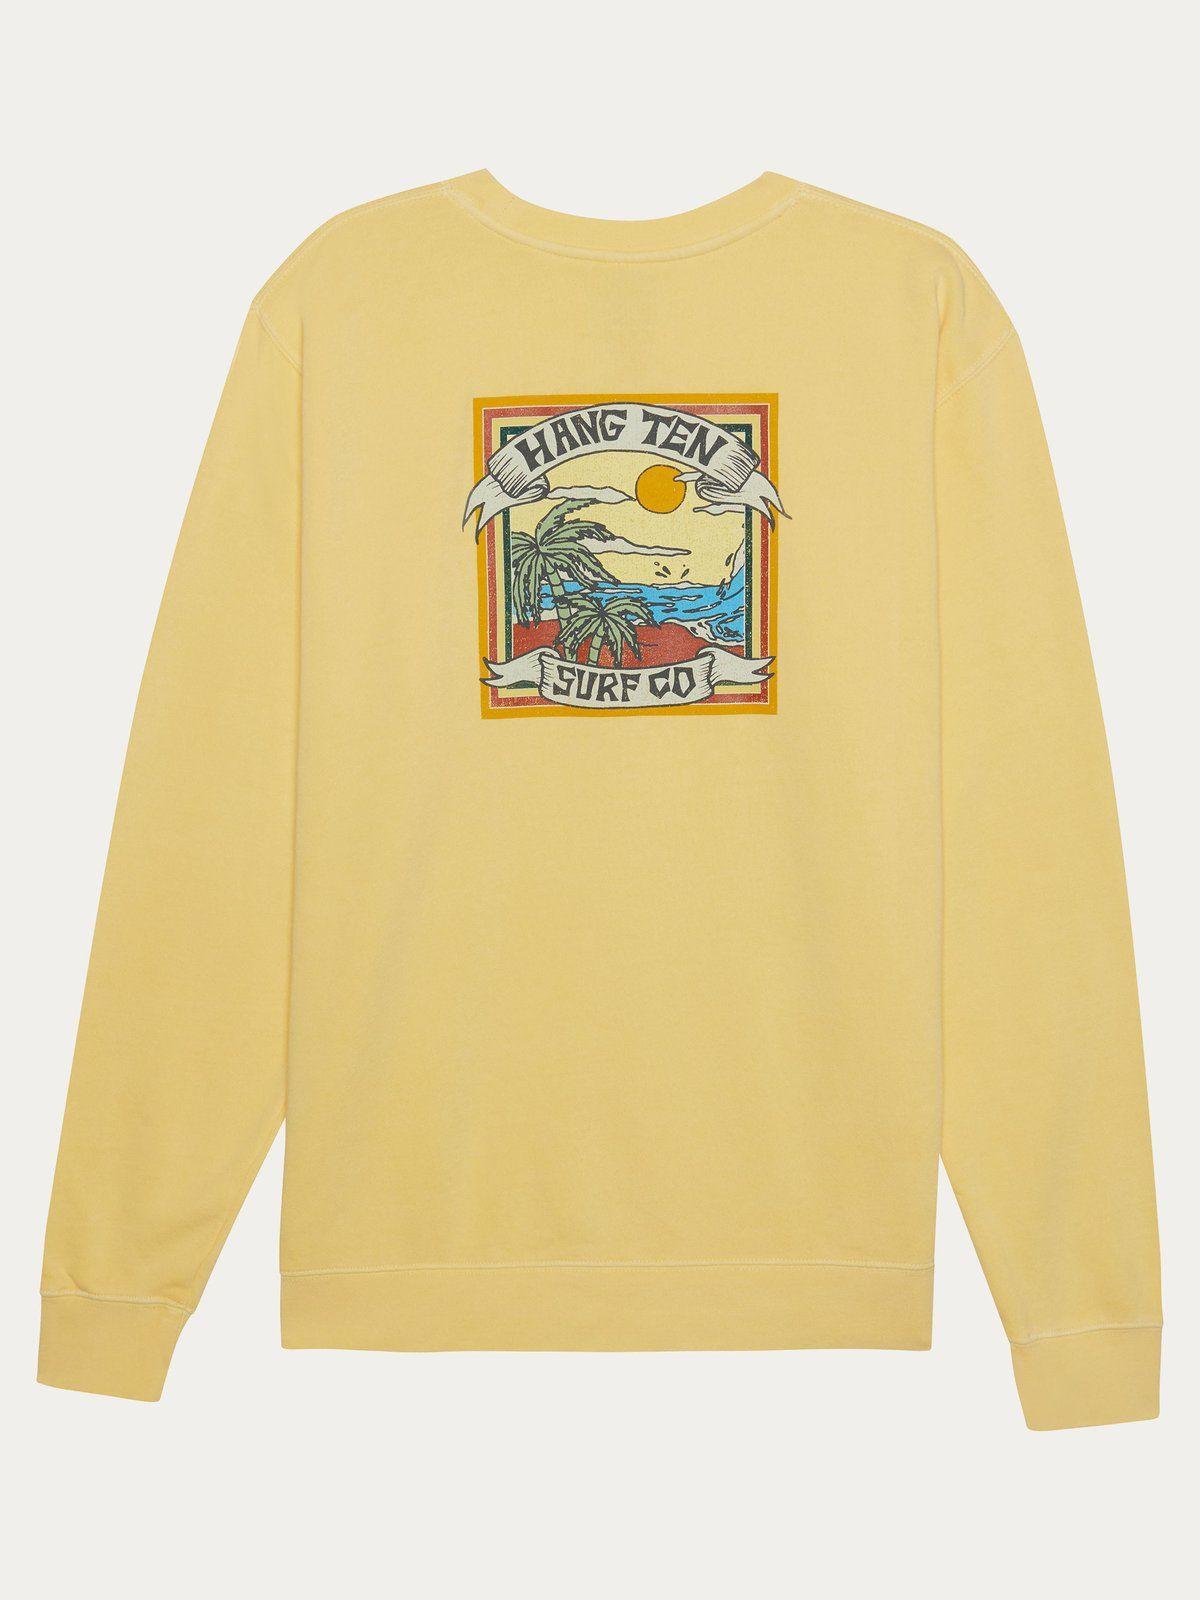 Iconic Sweatshirt In 2021 Sweatshirts Vintage Crewneck Sweatshirt Print Clothes [ 1600 x 1200 Pixel ]